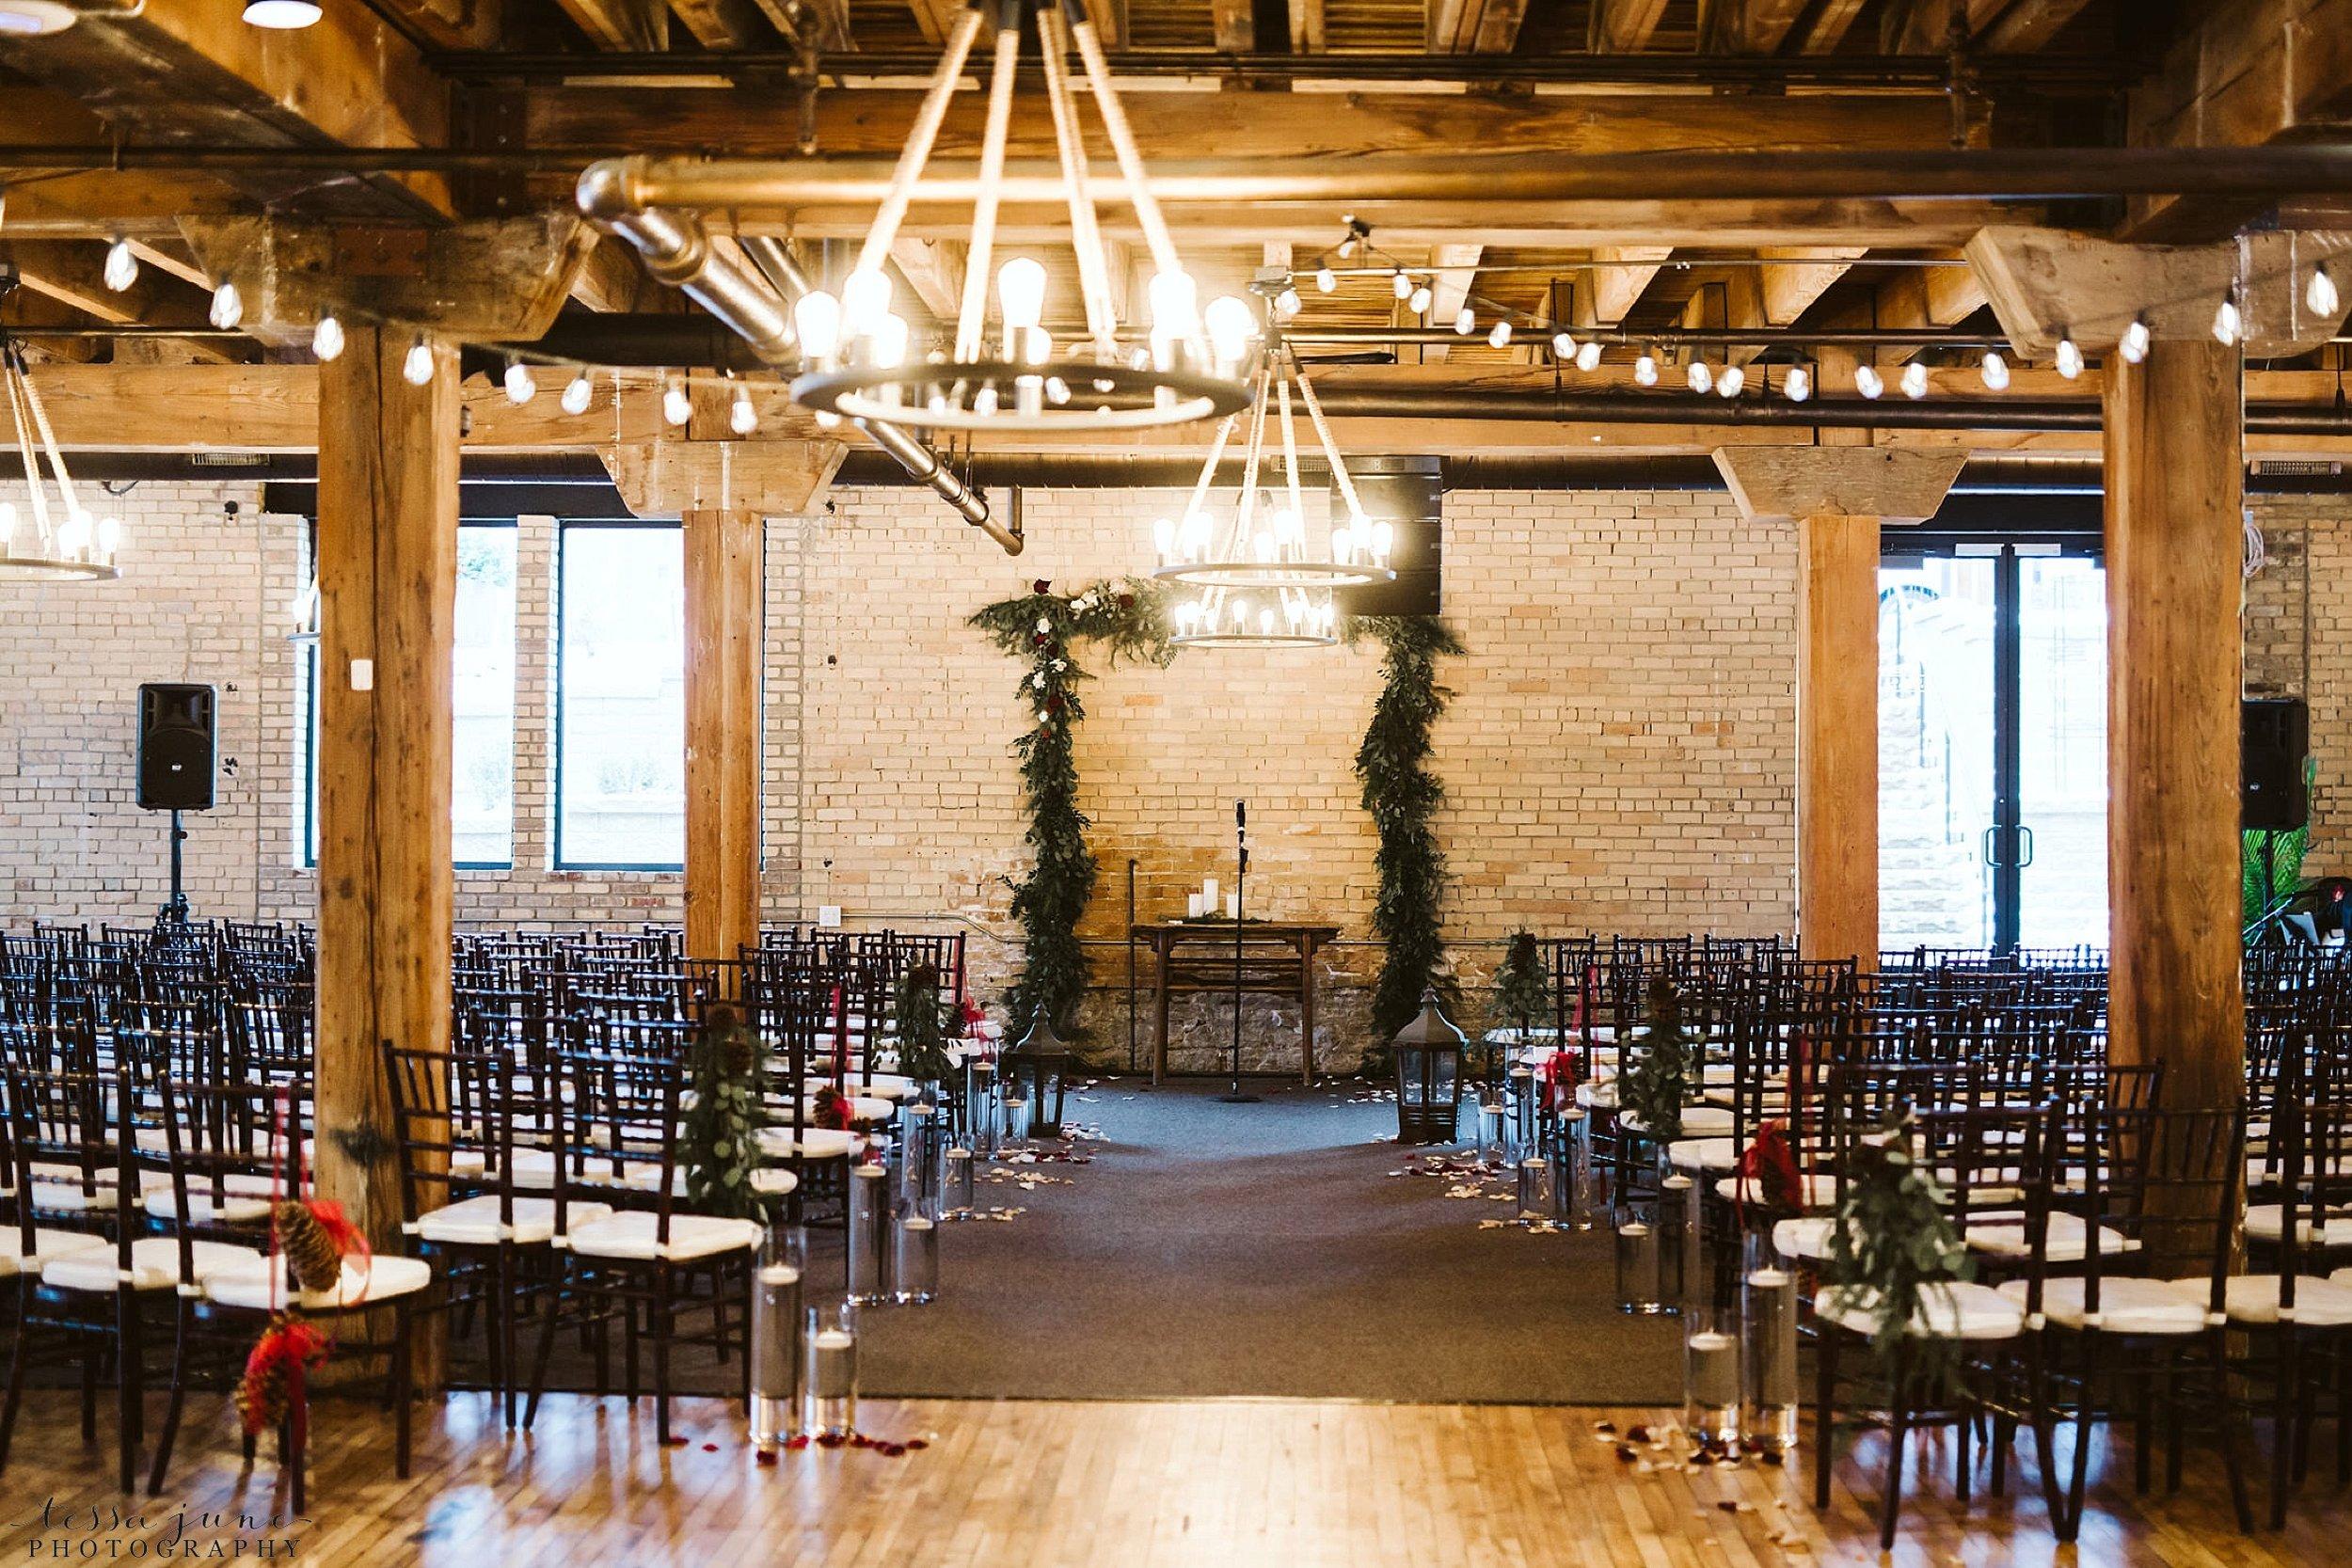 minneapolis-event-center-winter-romantic-snow-wedding-december-129.jpg